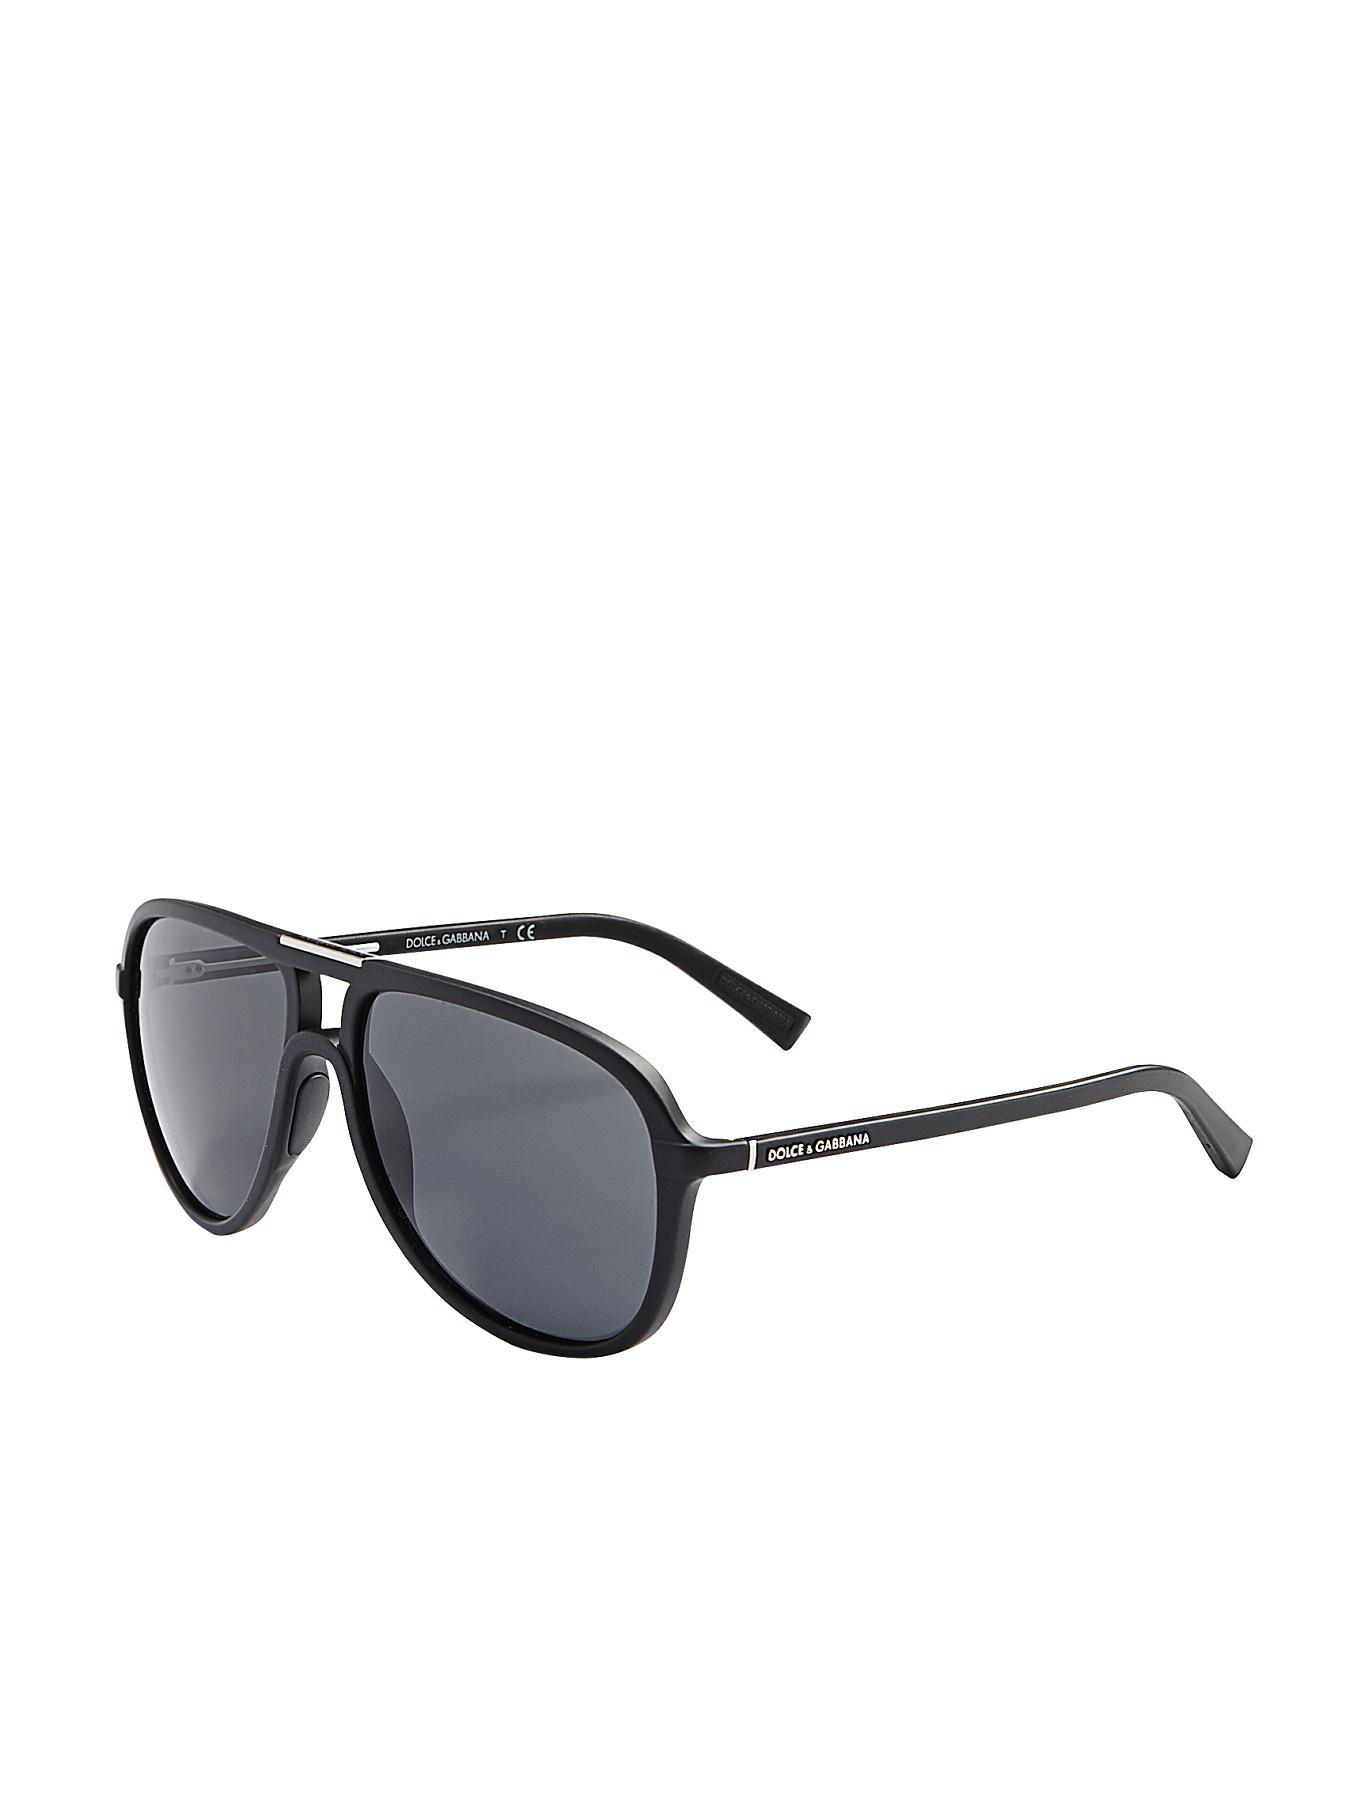 Dolce & Gabbana Aviator Sunglasses - Black - Black, Black